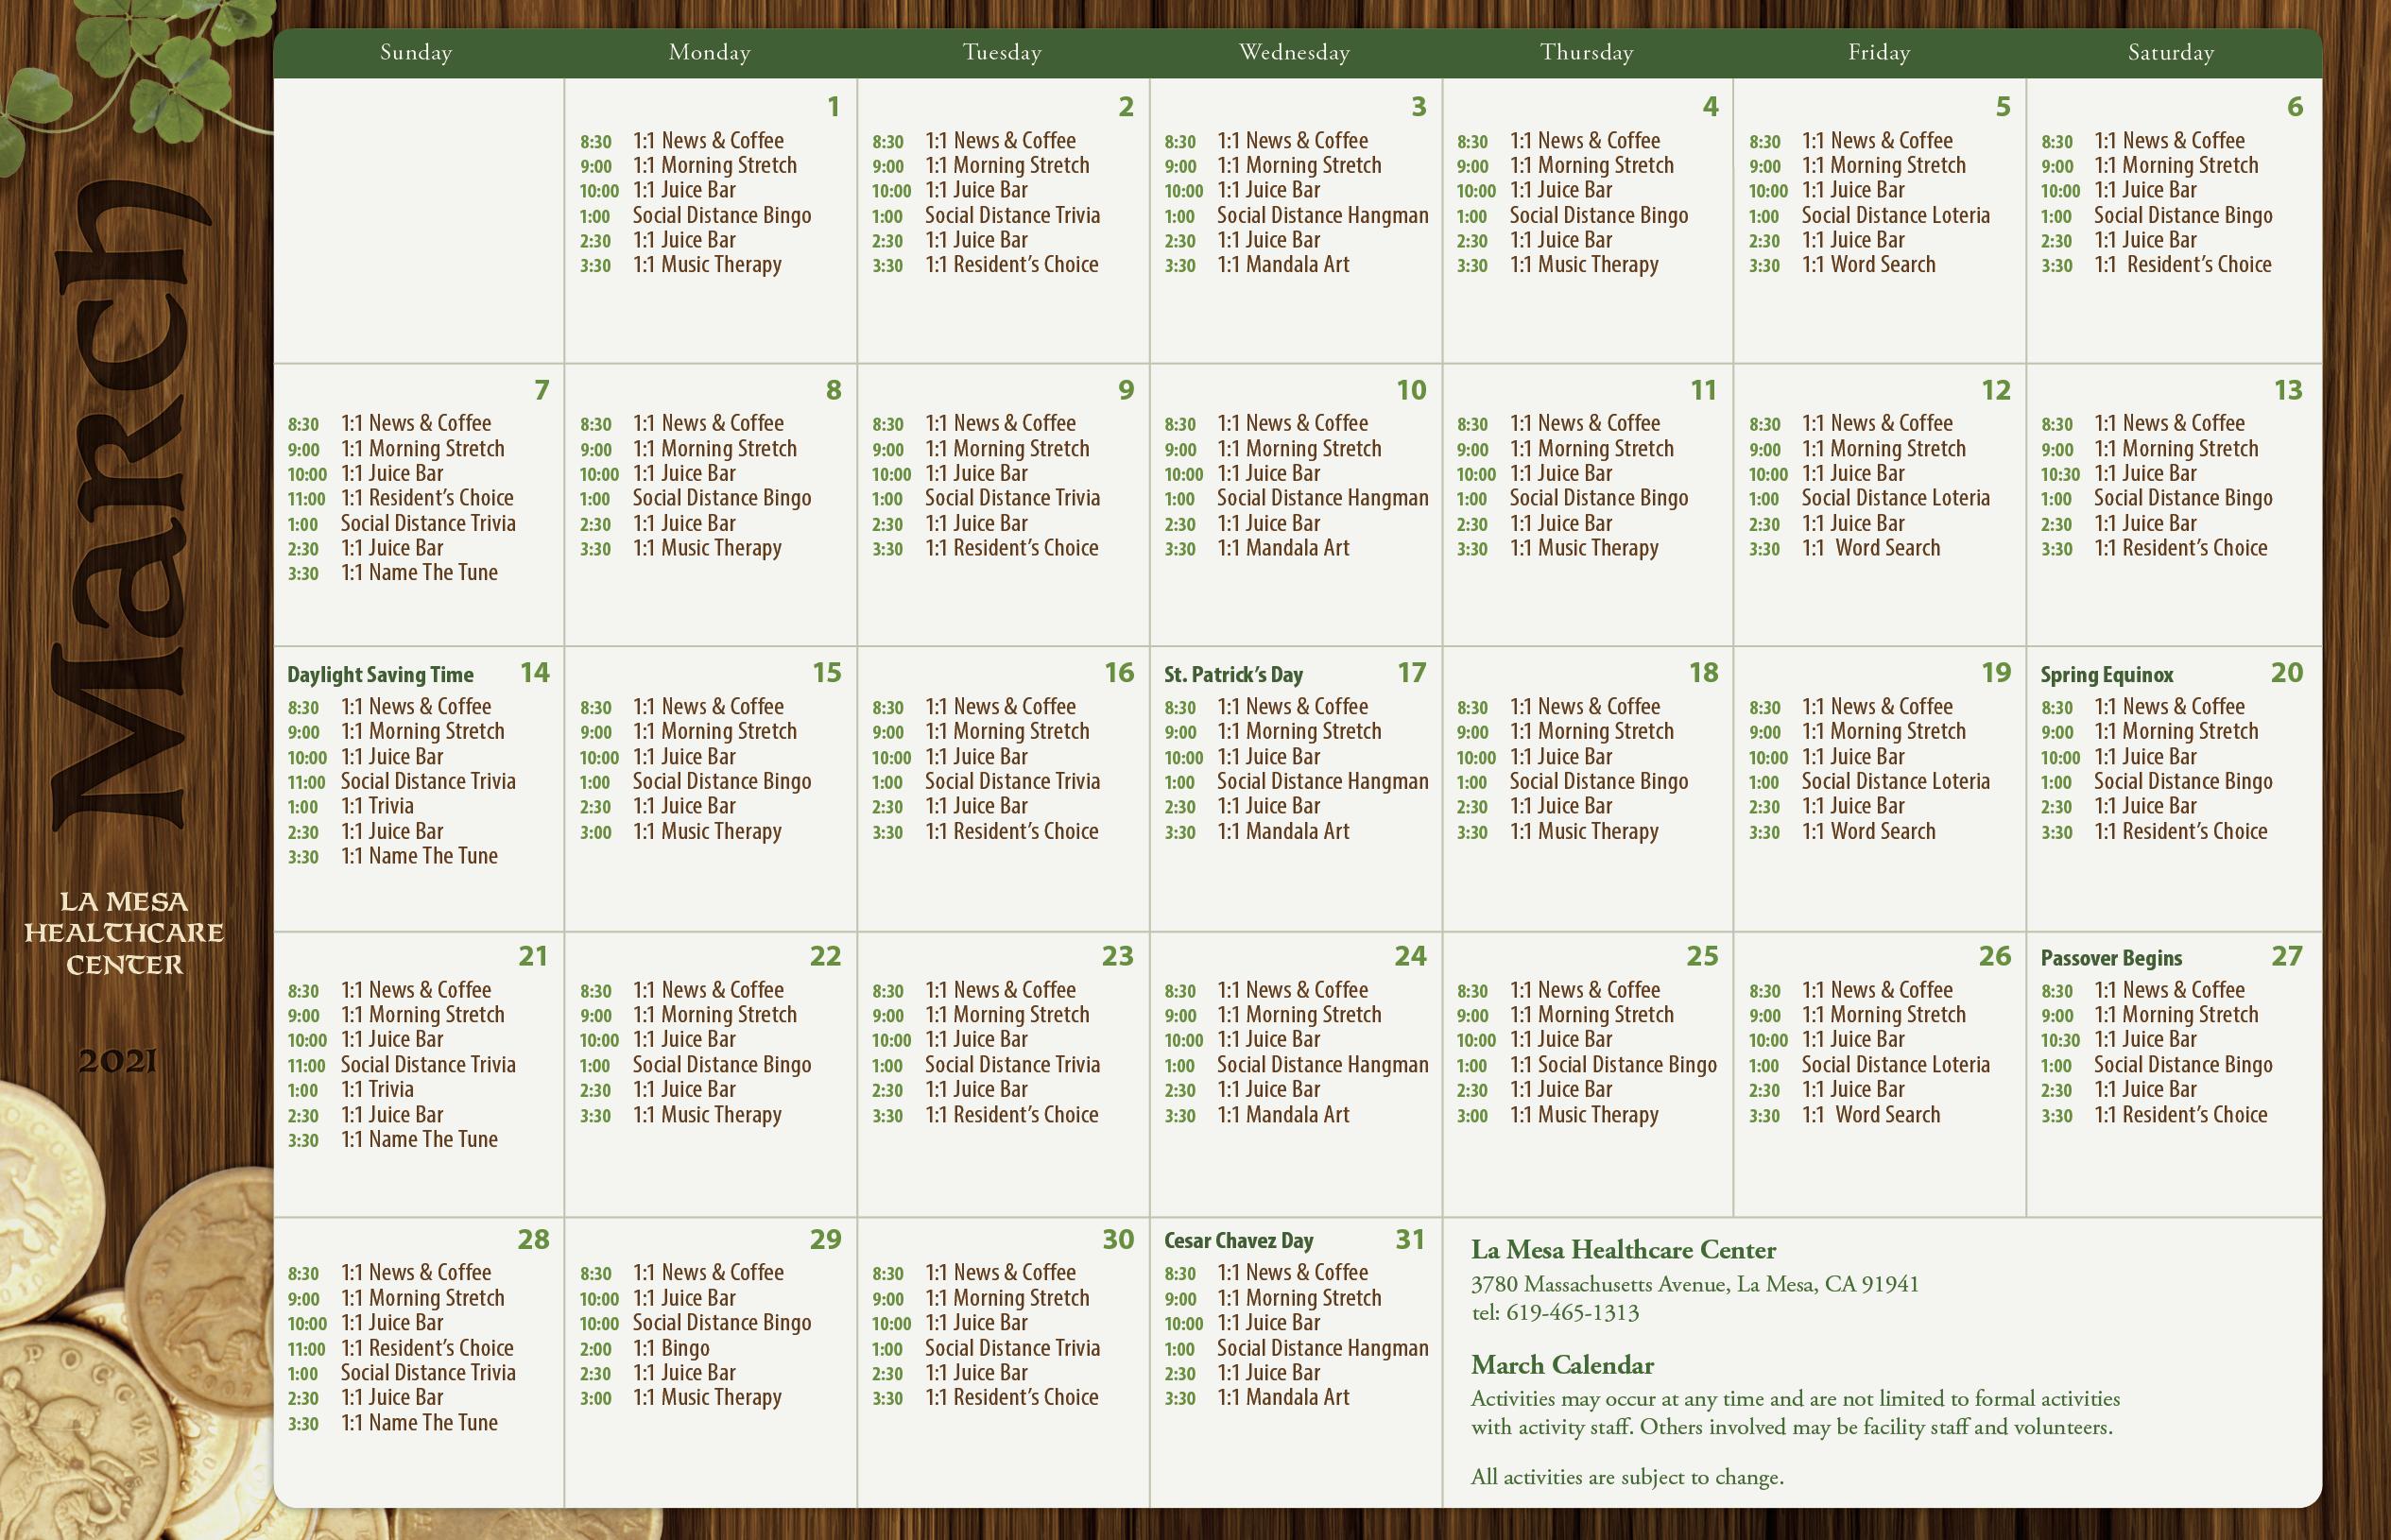 March 2021 Calendar For La Mesa